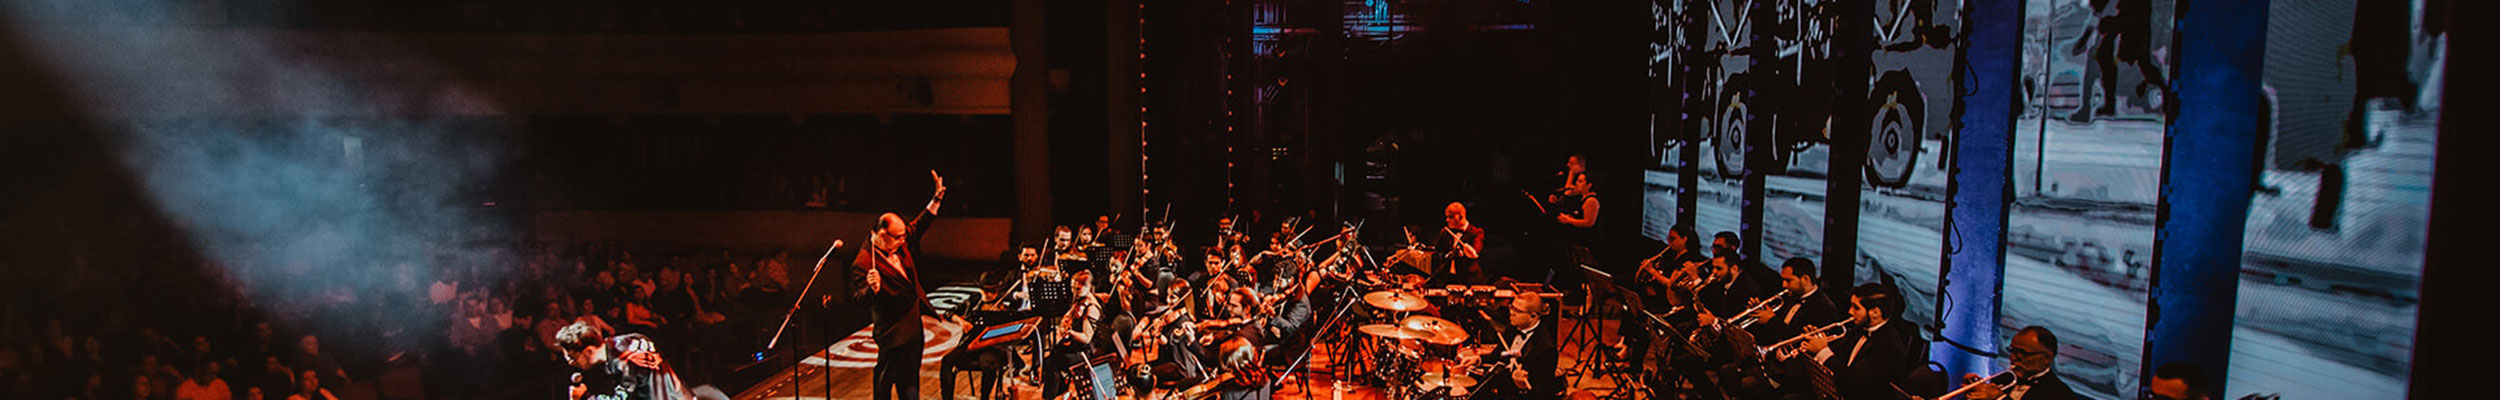 Philharmonic custom made shows.